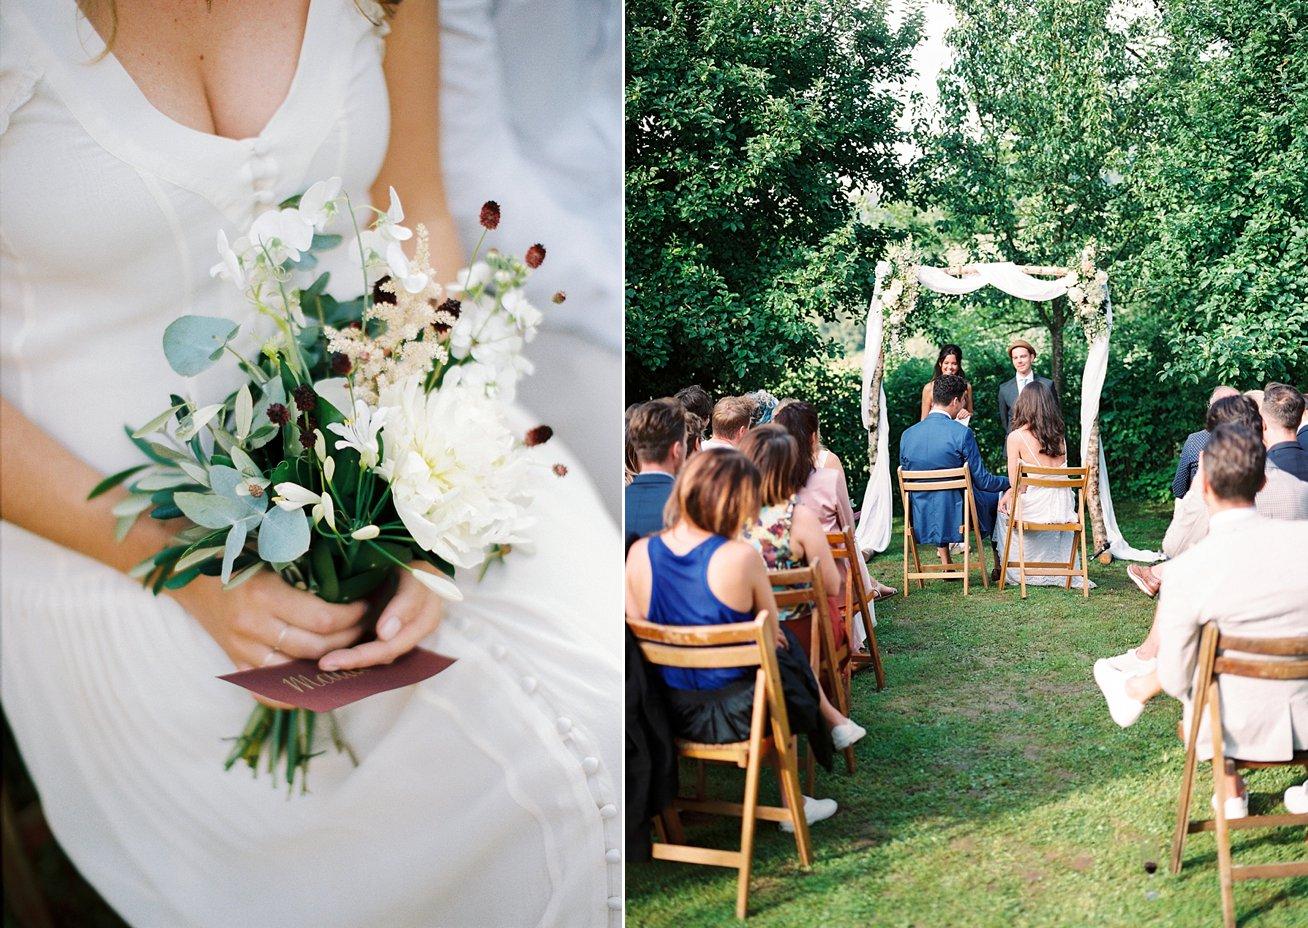 Amanda-Drost-photography-wedding-bruioft-zuid-limburg-hoeve-vernelsveld_0013.jpg